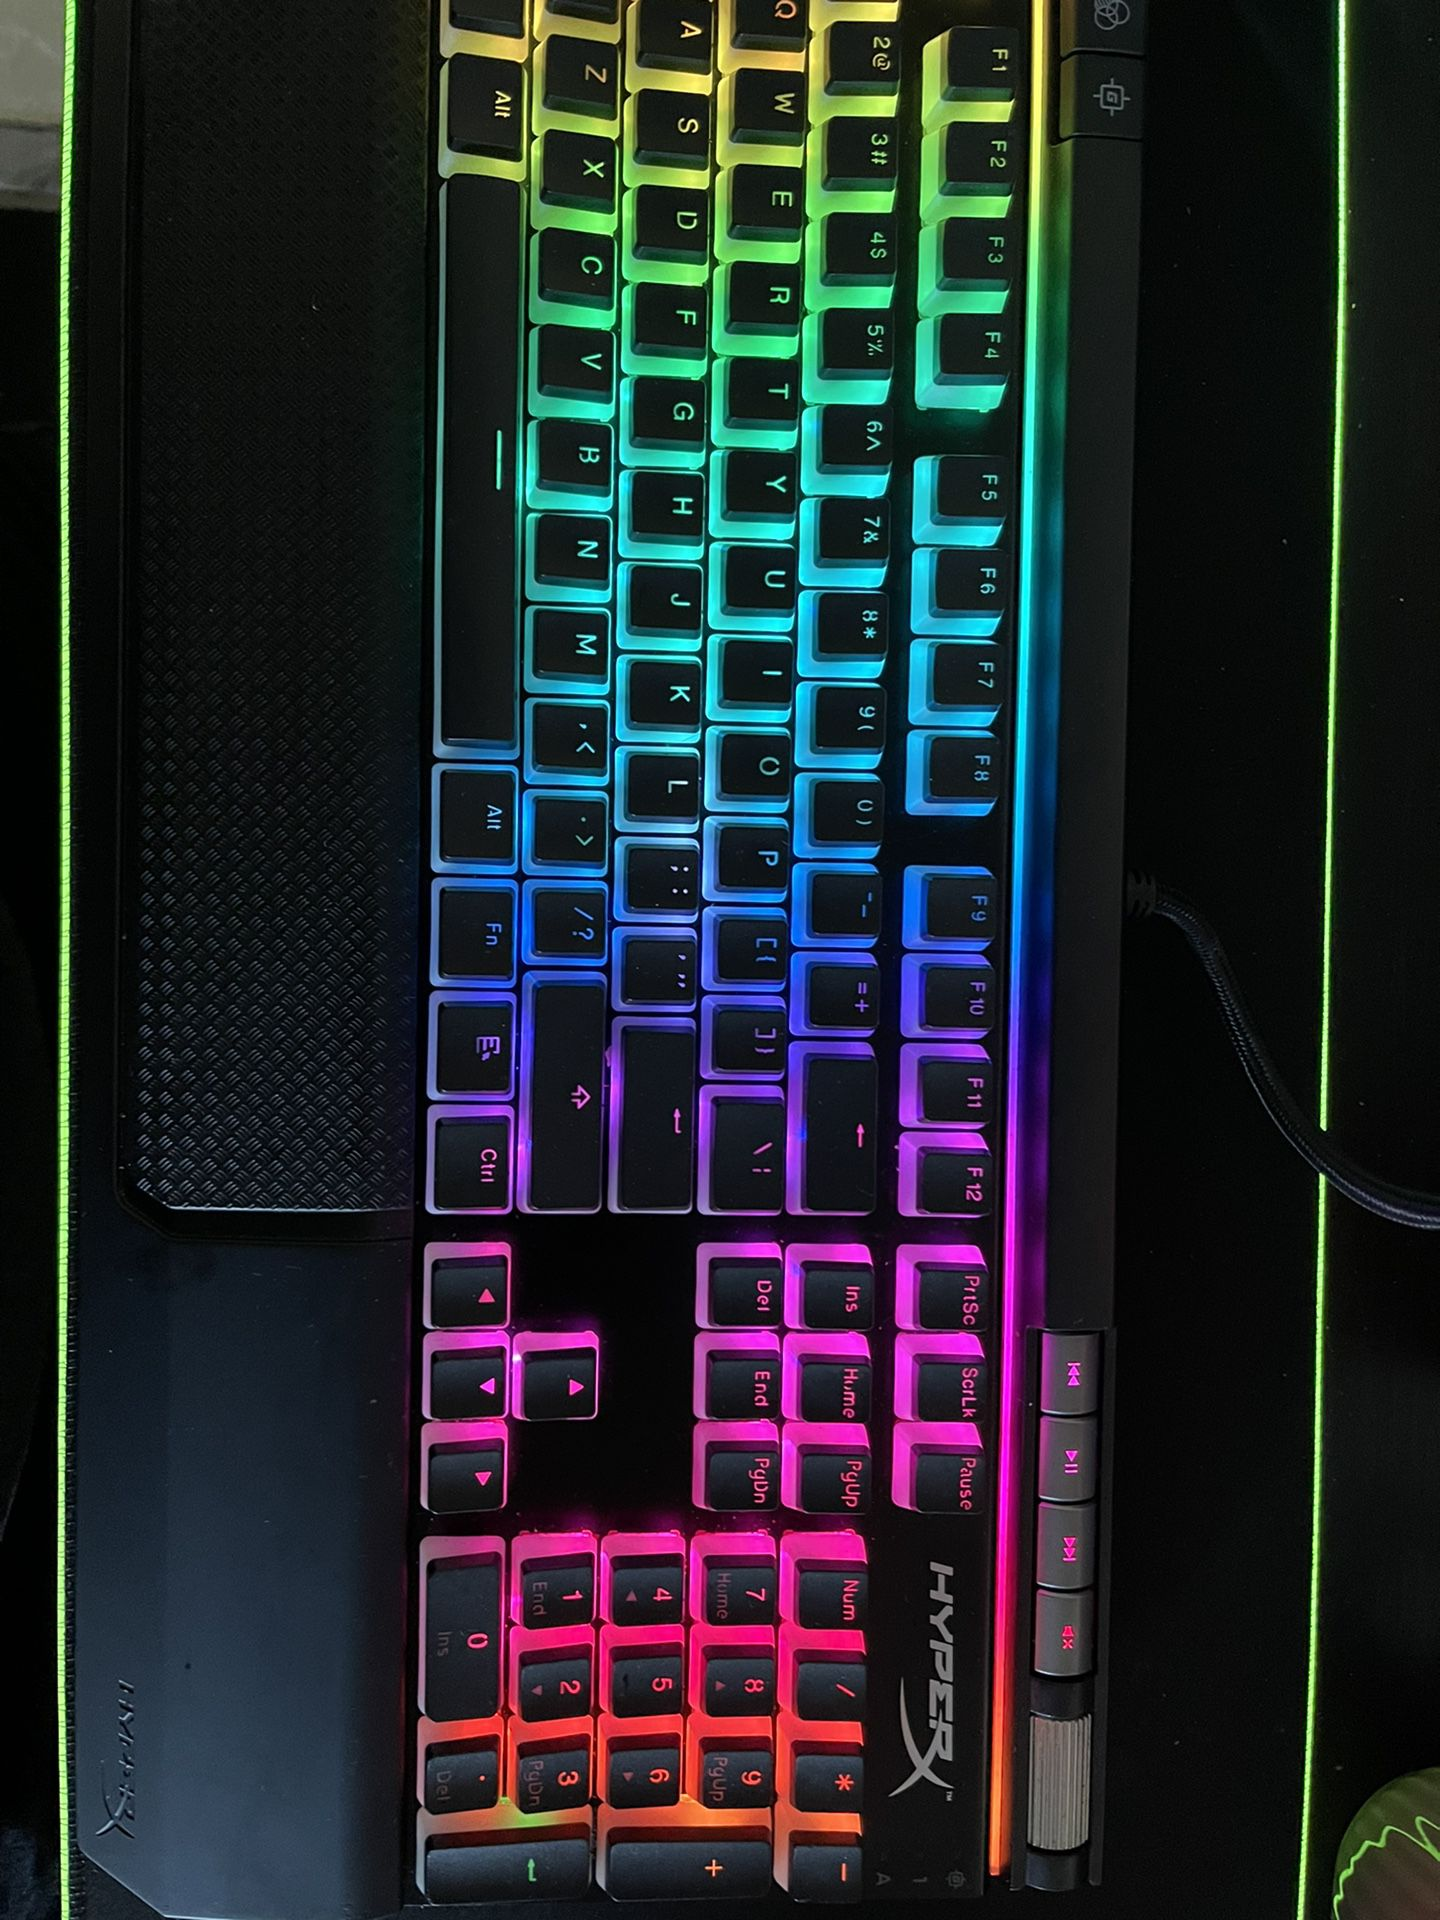 HyperX Alloy RGB Mechanical Keyboard With Cherry MX Brown